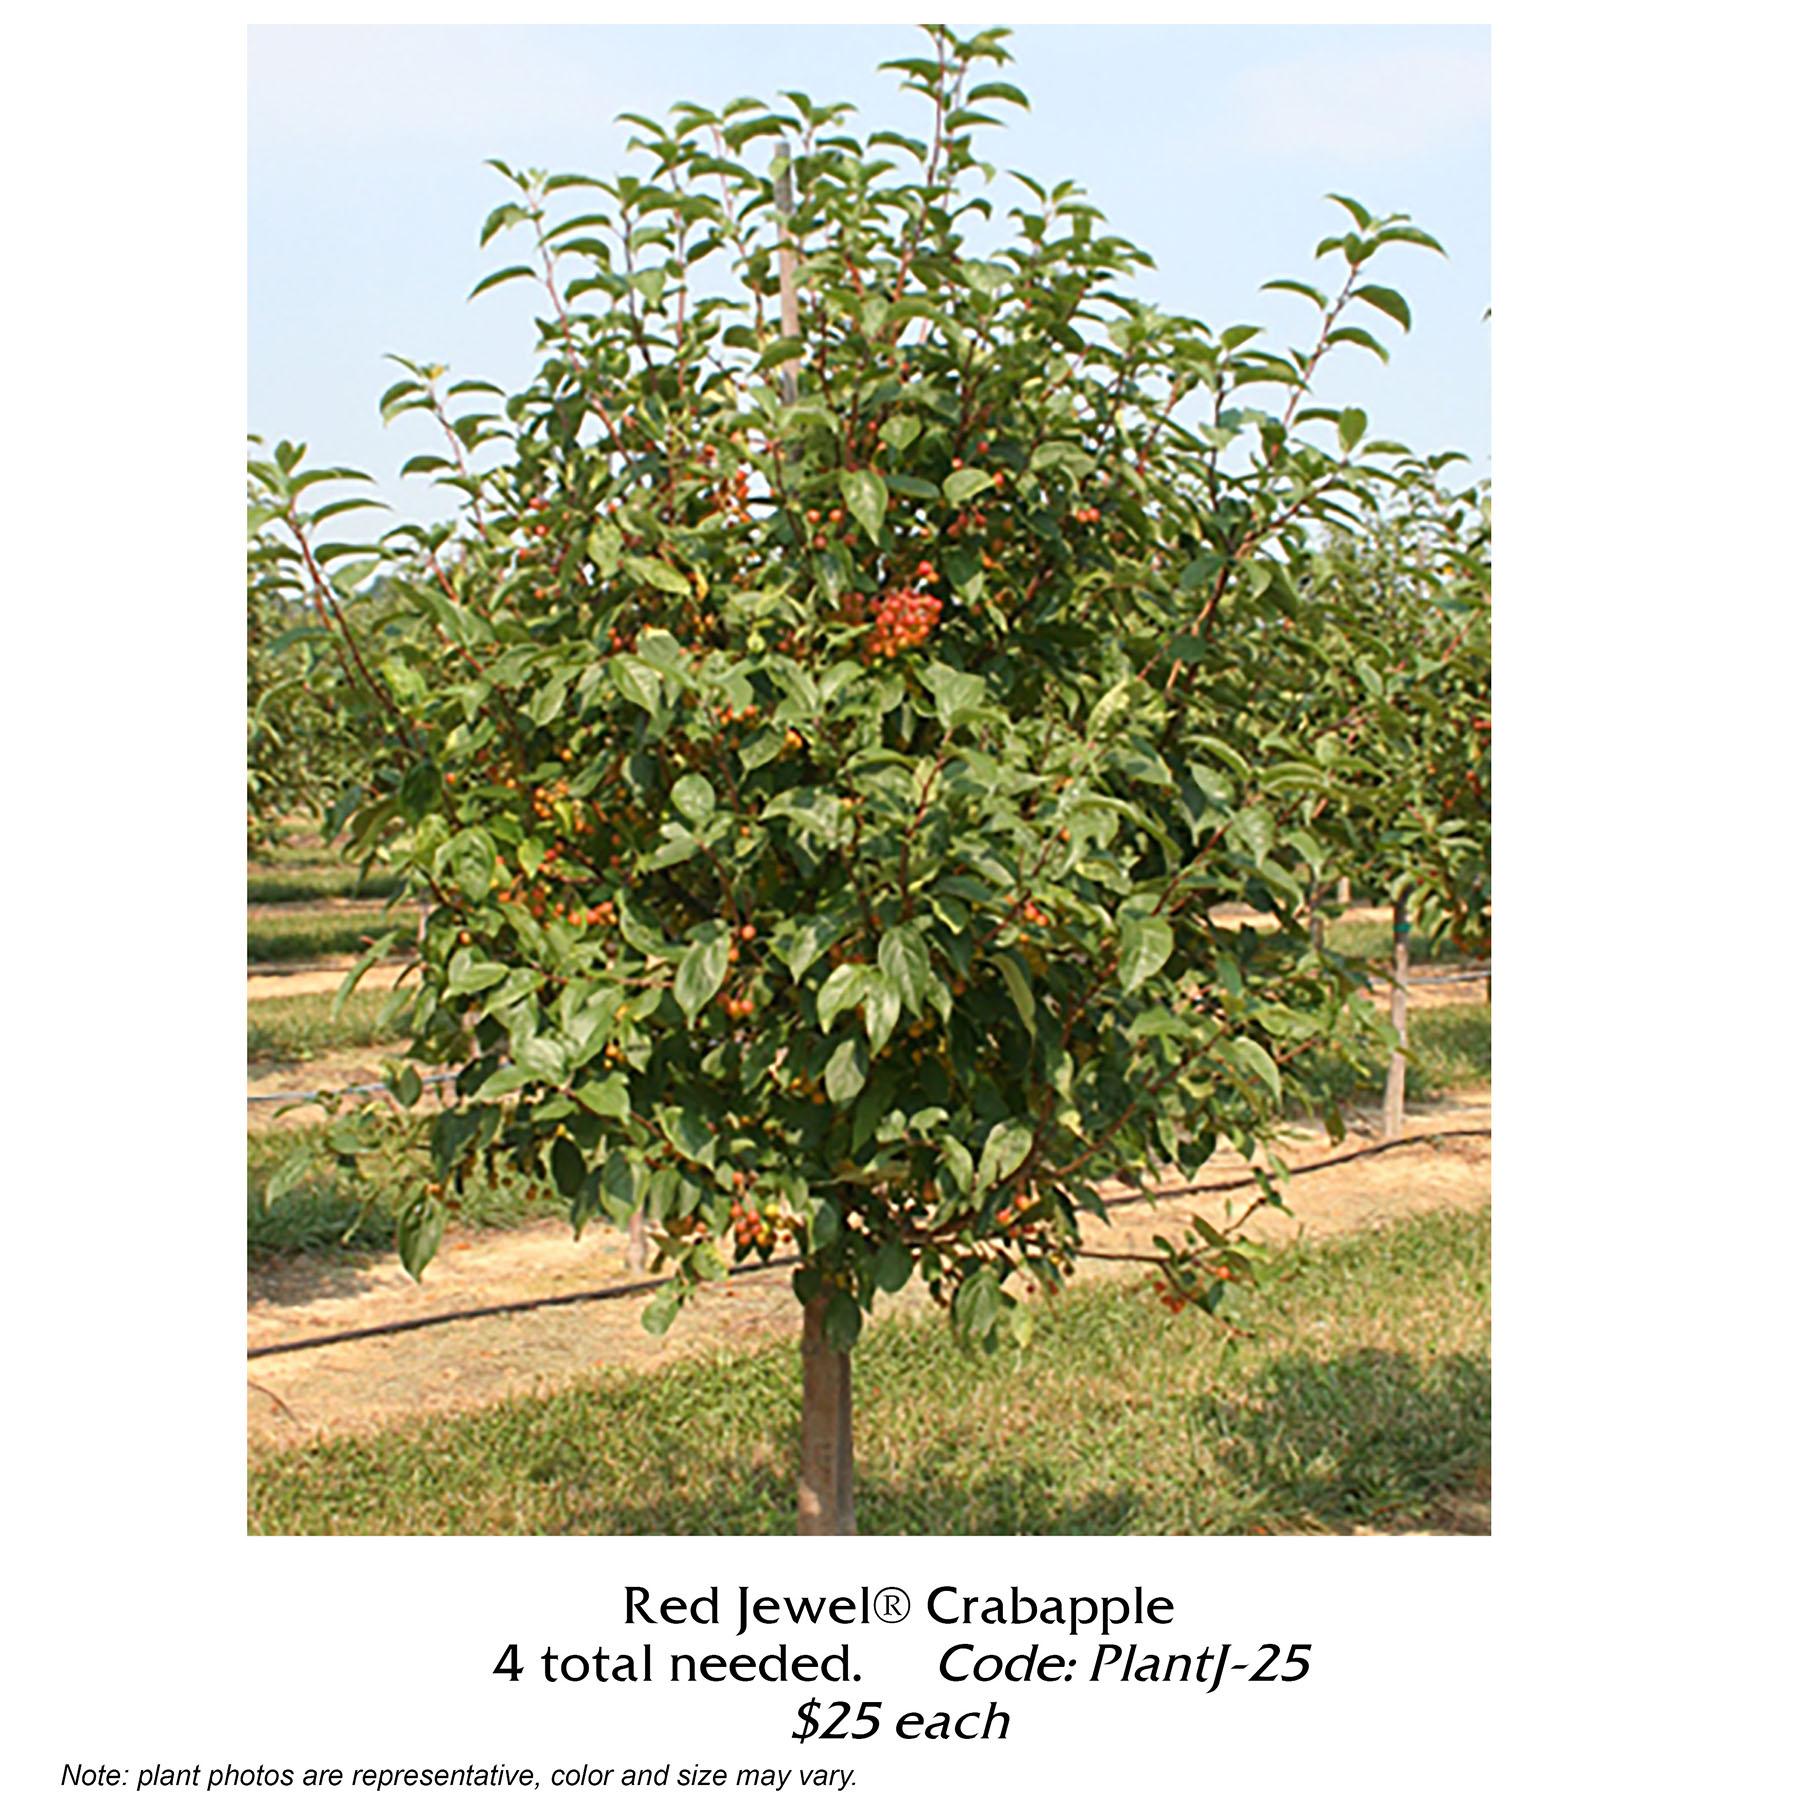 red jewel crabapple tree.jpg